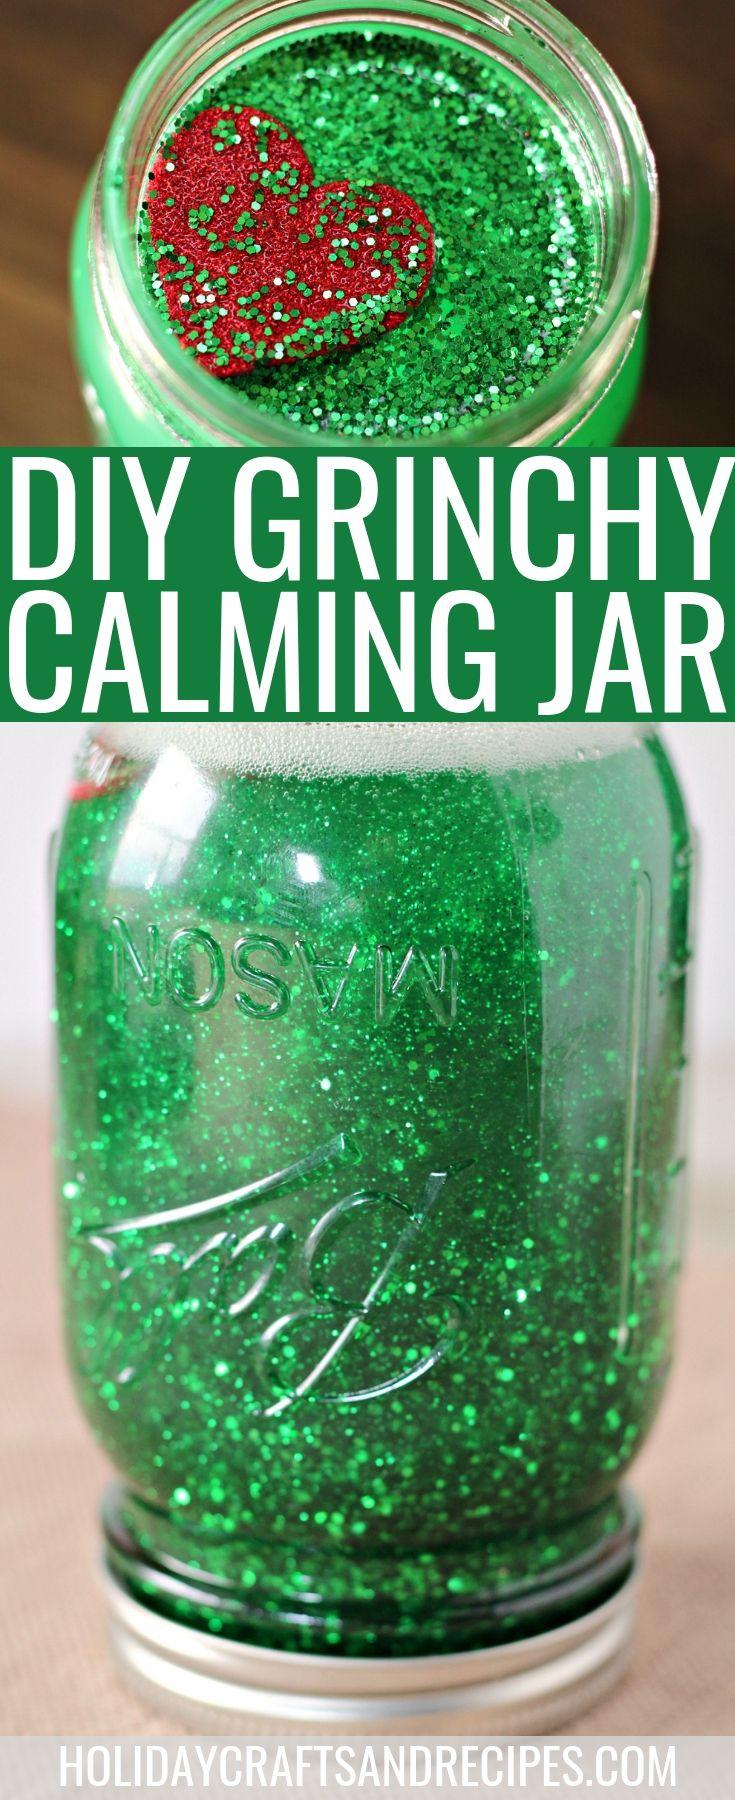 DIY Grinchy calming jar | calming jar | calming jar craft | Christmas calming ja...